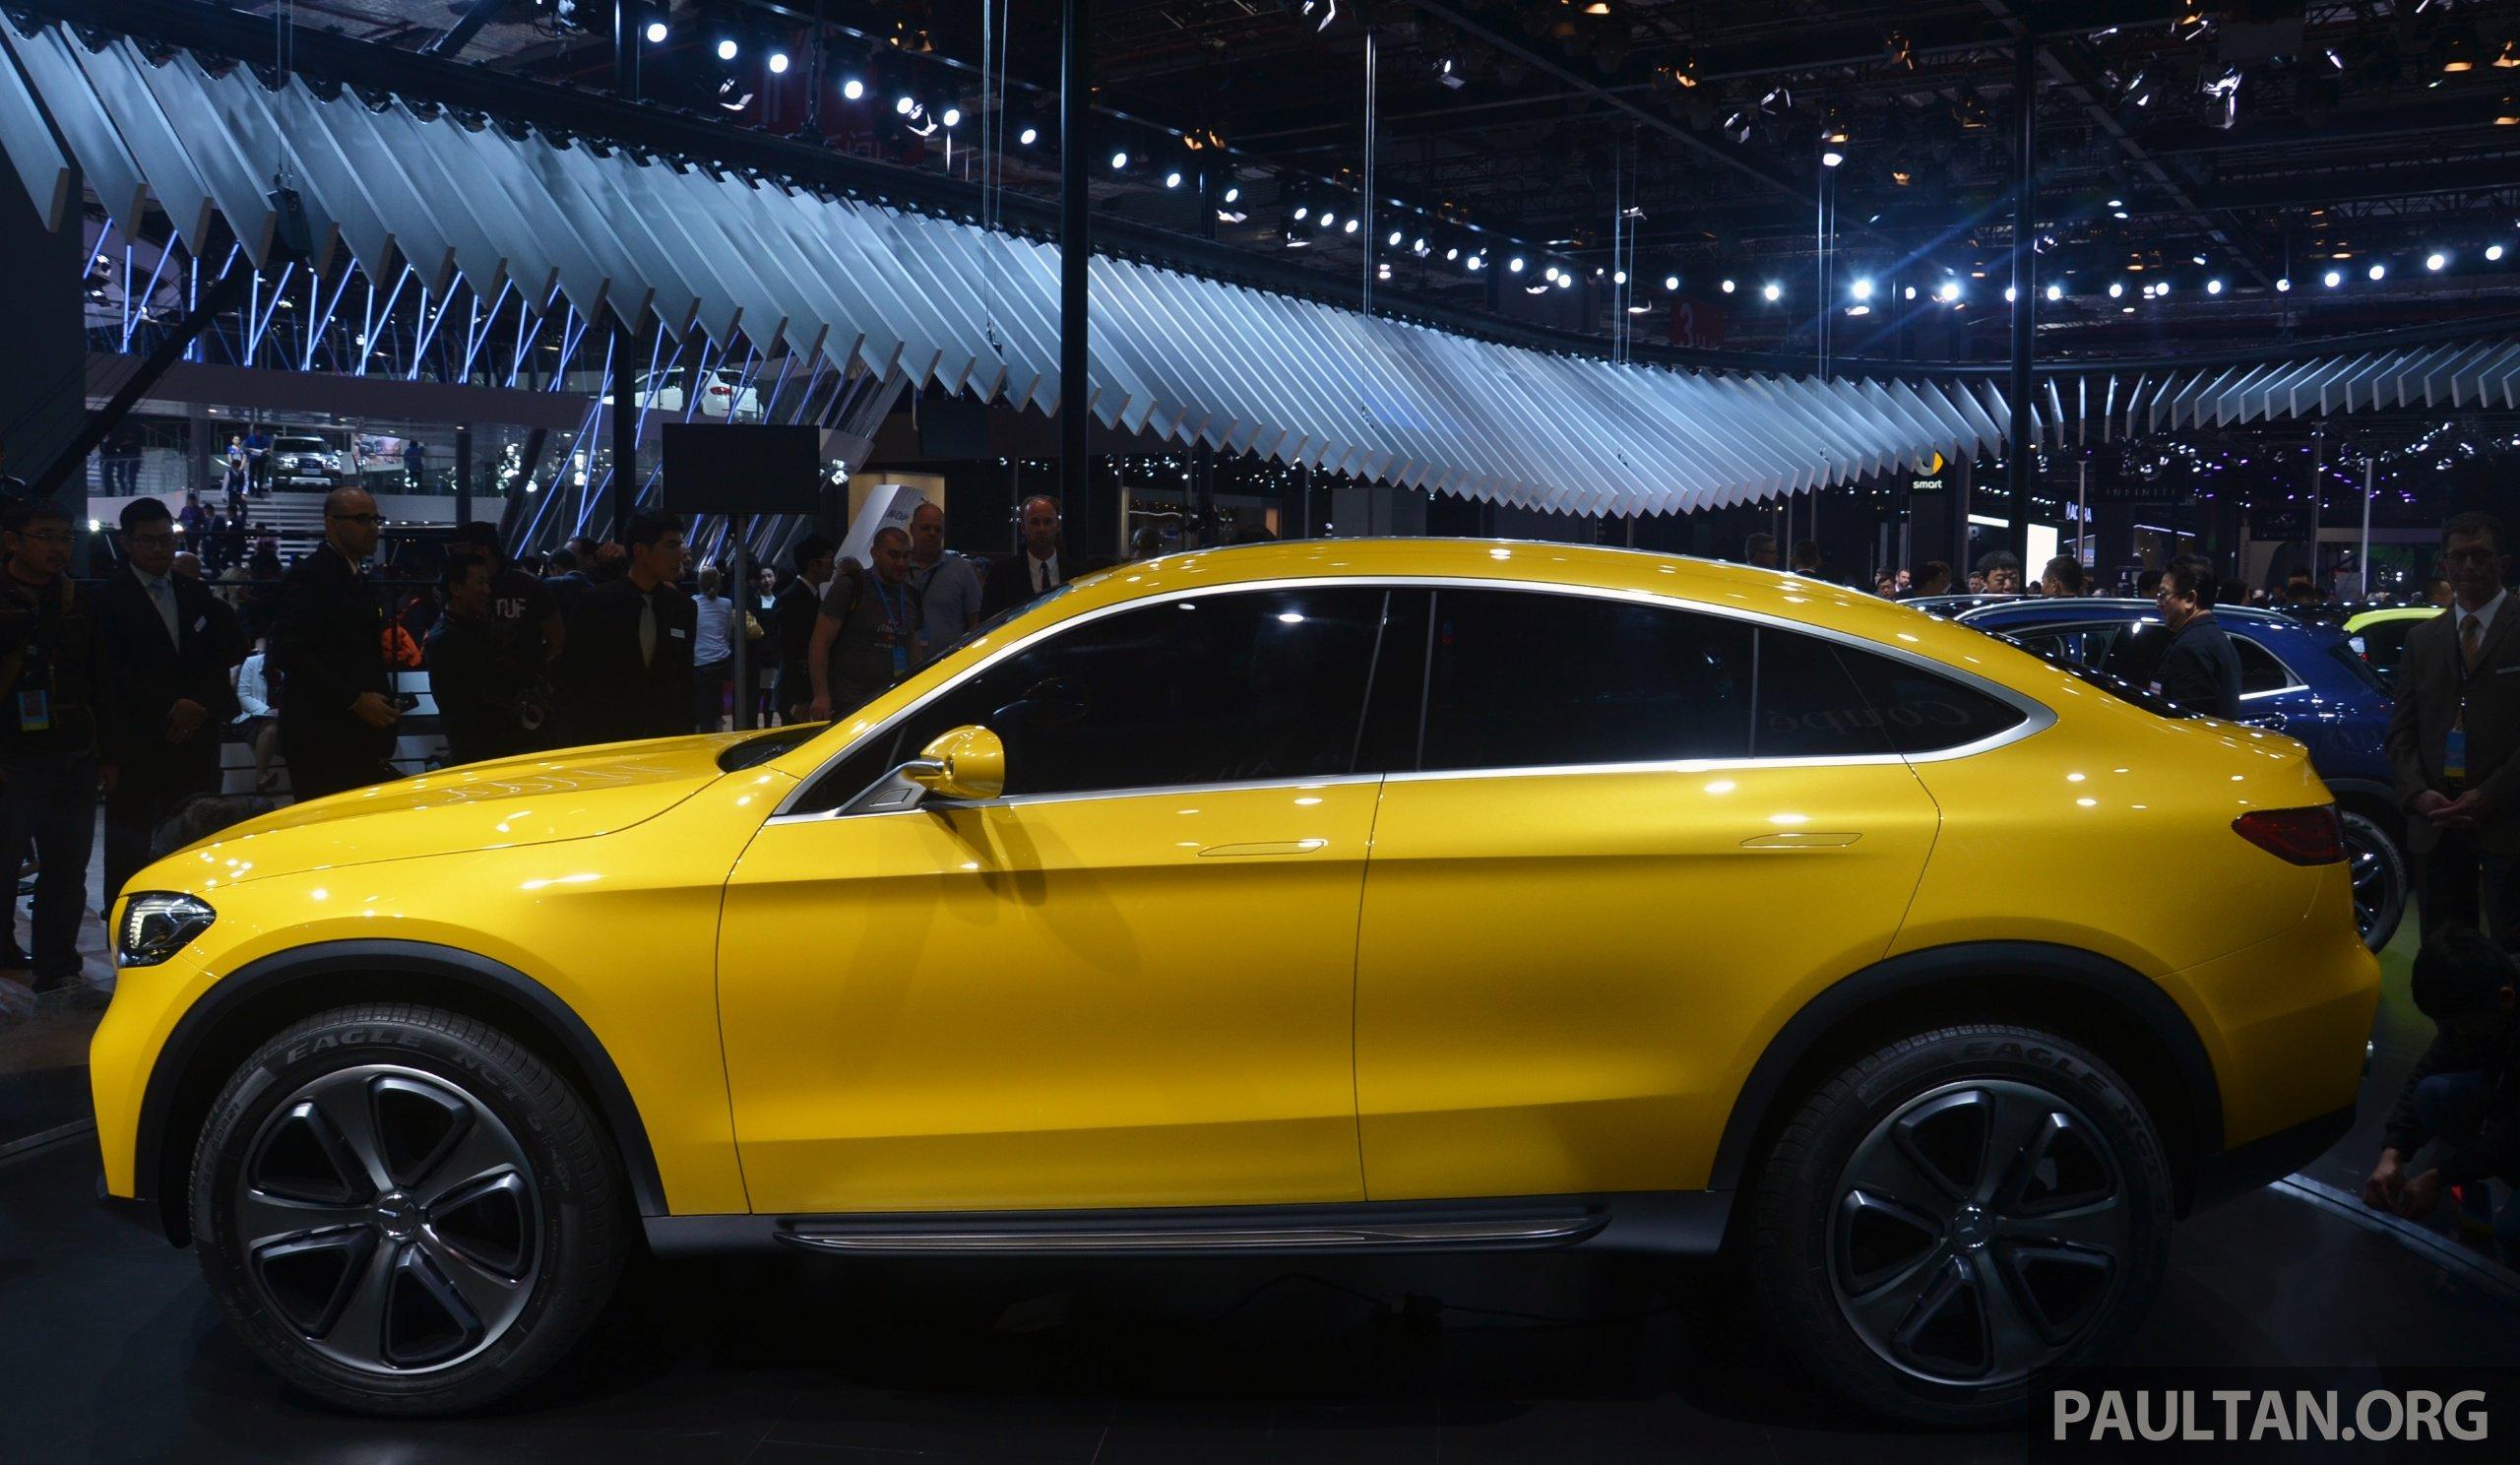 Shanghai 2015: Mercedes-Benz Concept GLC Coupe Image 330536